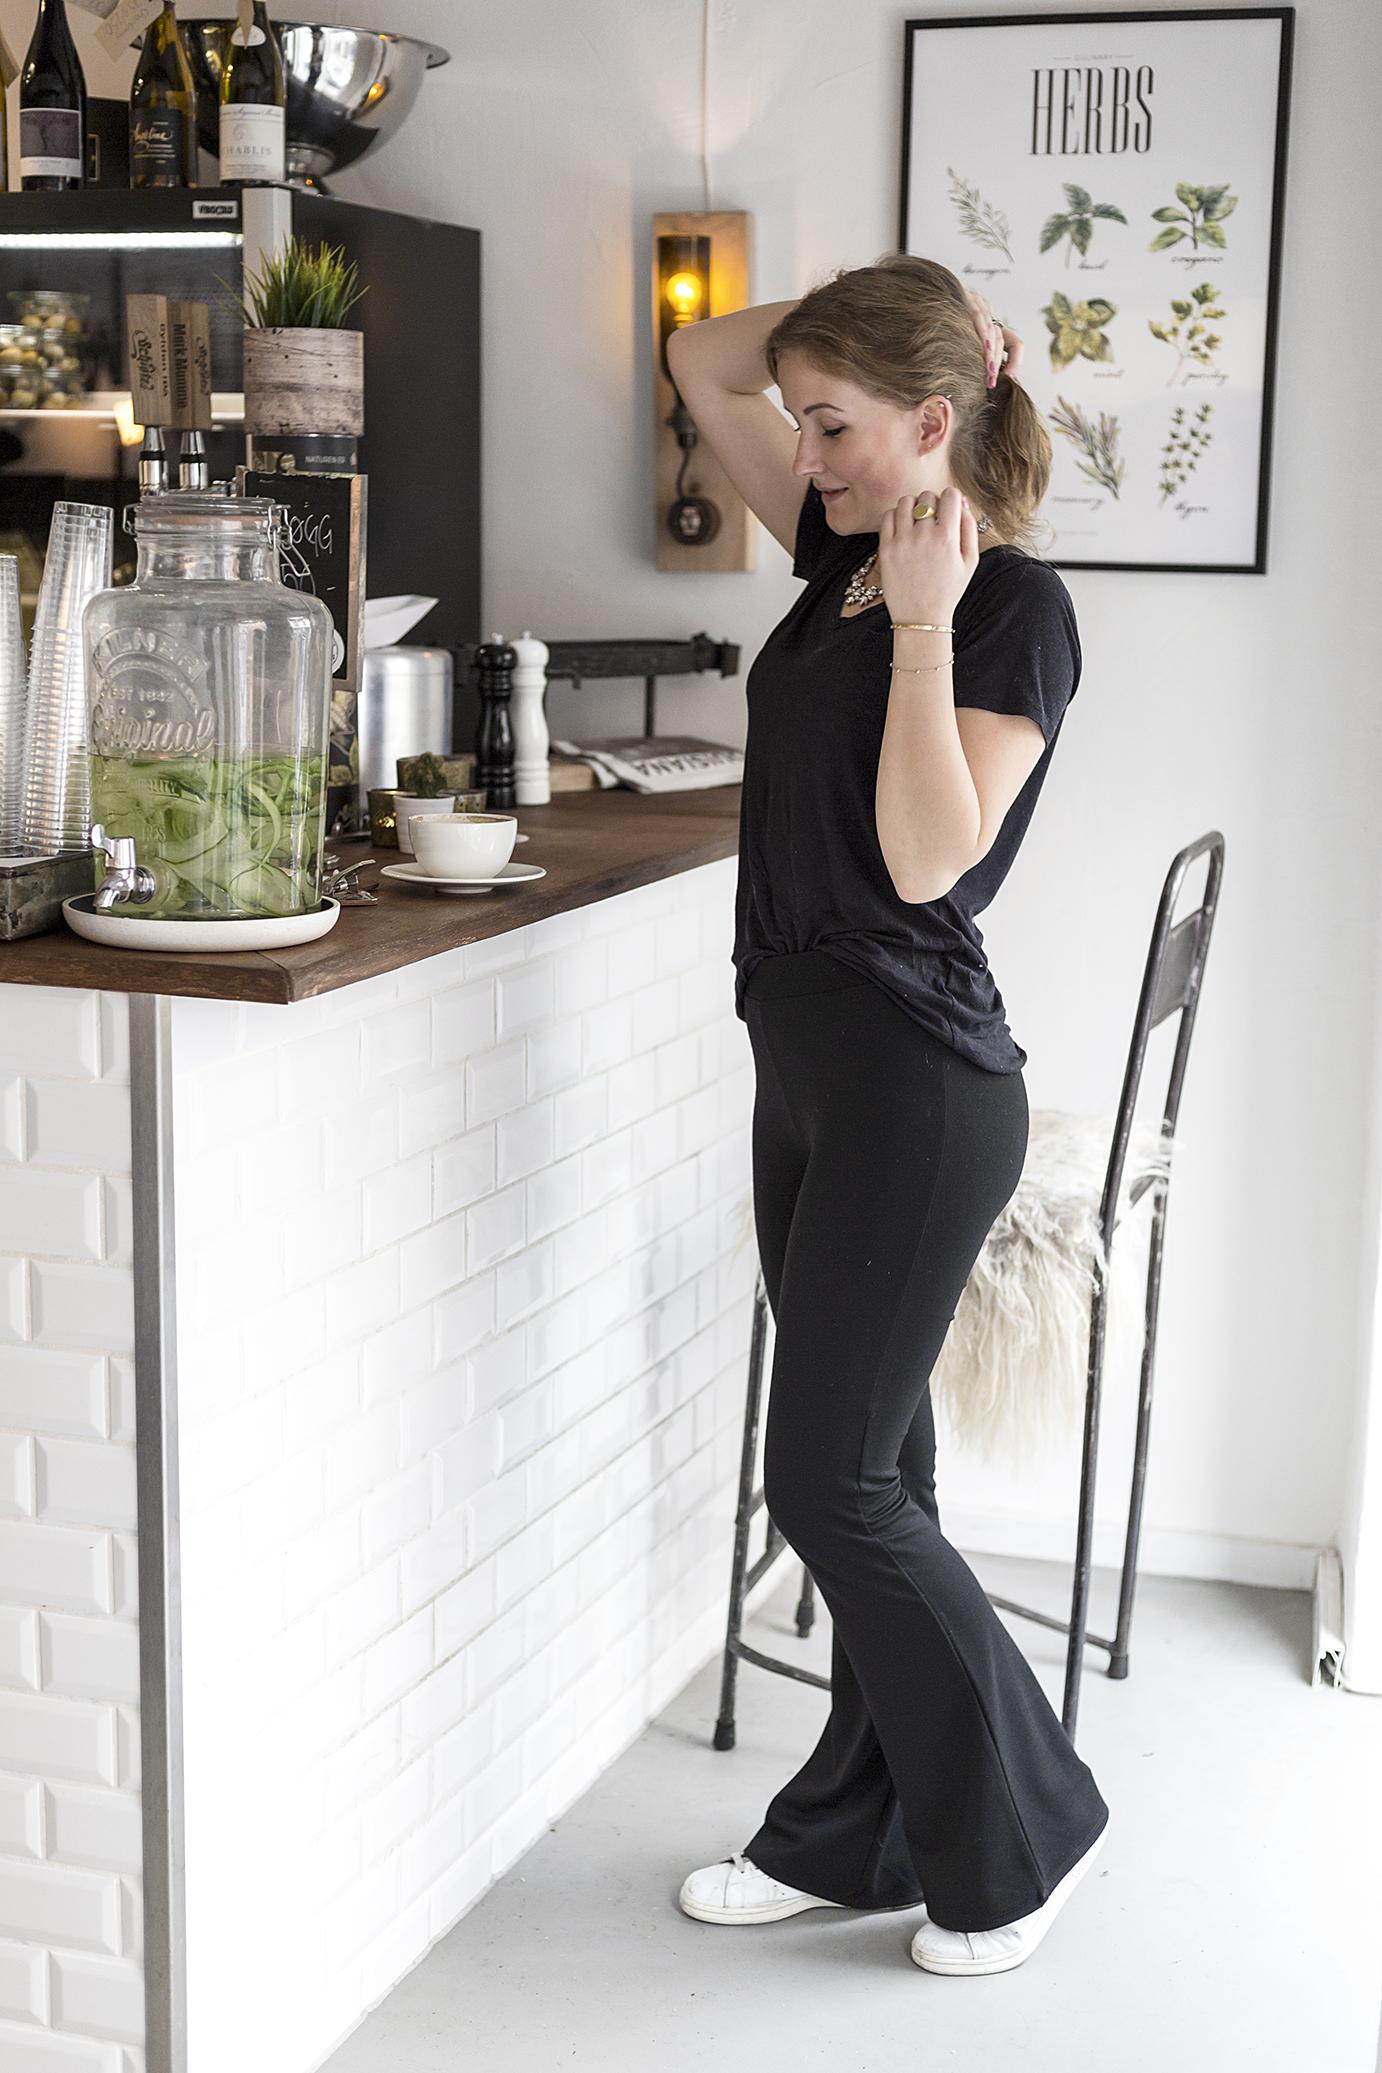 Caroline Sølver